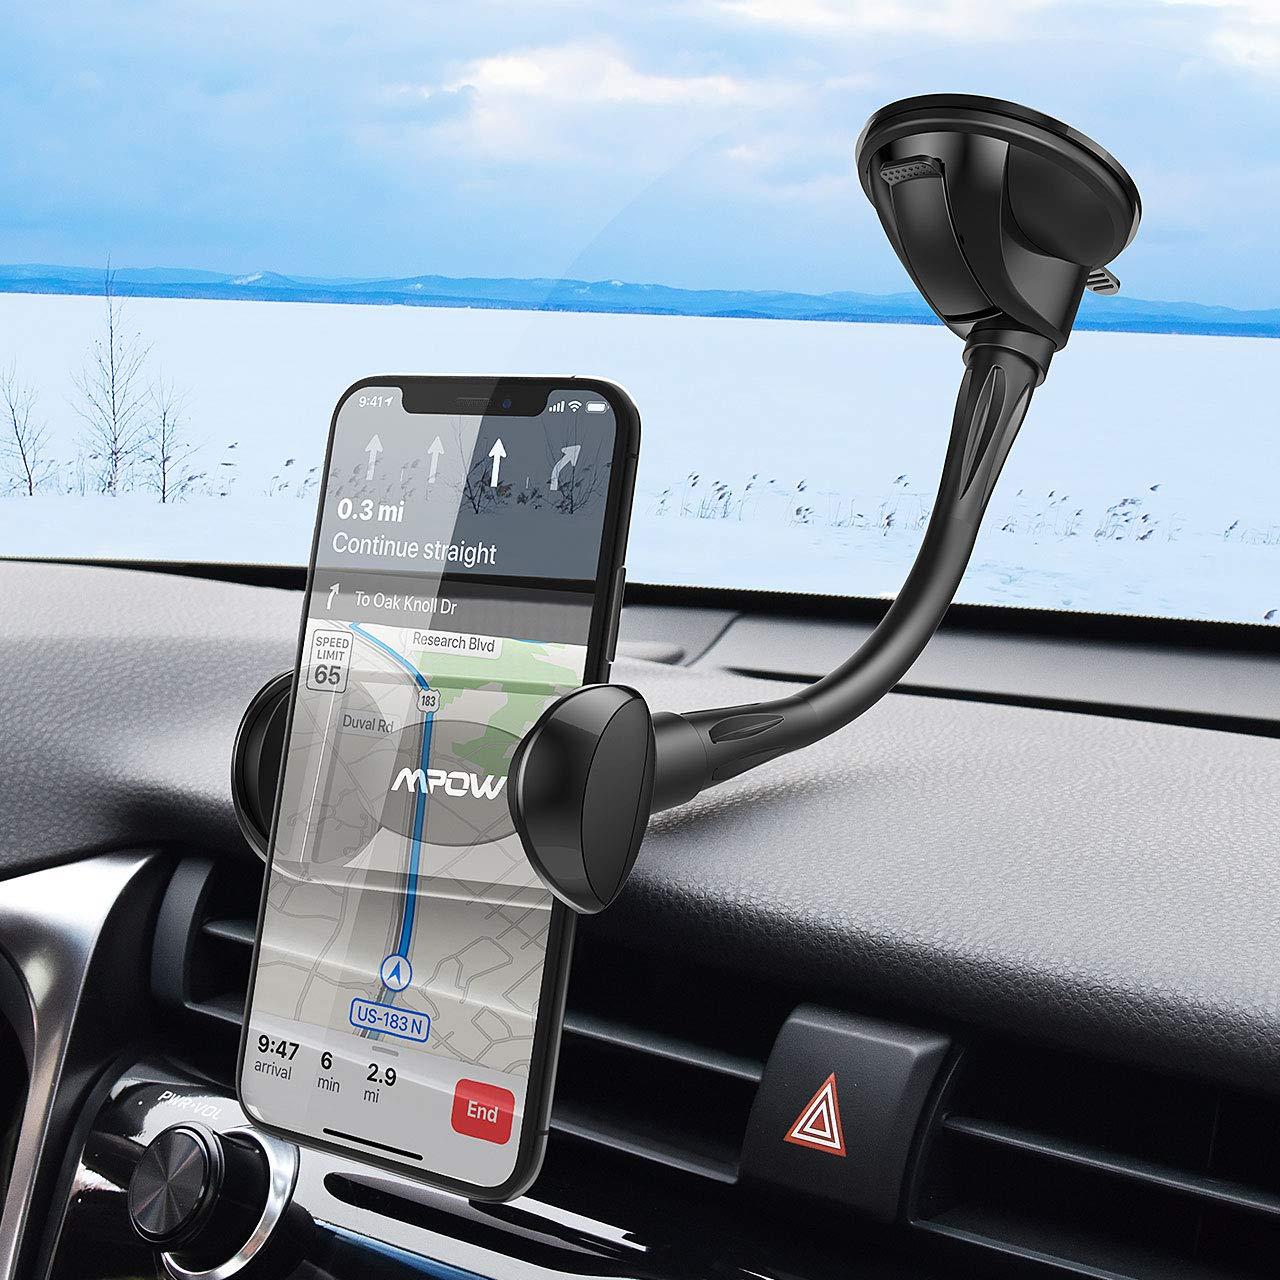 Mpow Soporte M/óvil Coche para Parabrisas Sujeta Movil Coche Moviles Brazo Largo y Ventosa Lavable Soporte Telefonos Moviles Coche Universal 4-6.5 para iPhone 11 Pro MAX XR 8 Galaxy S20 Huawei P30